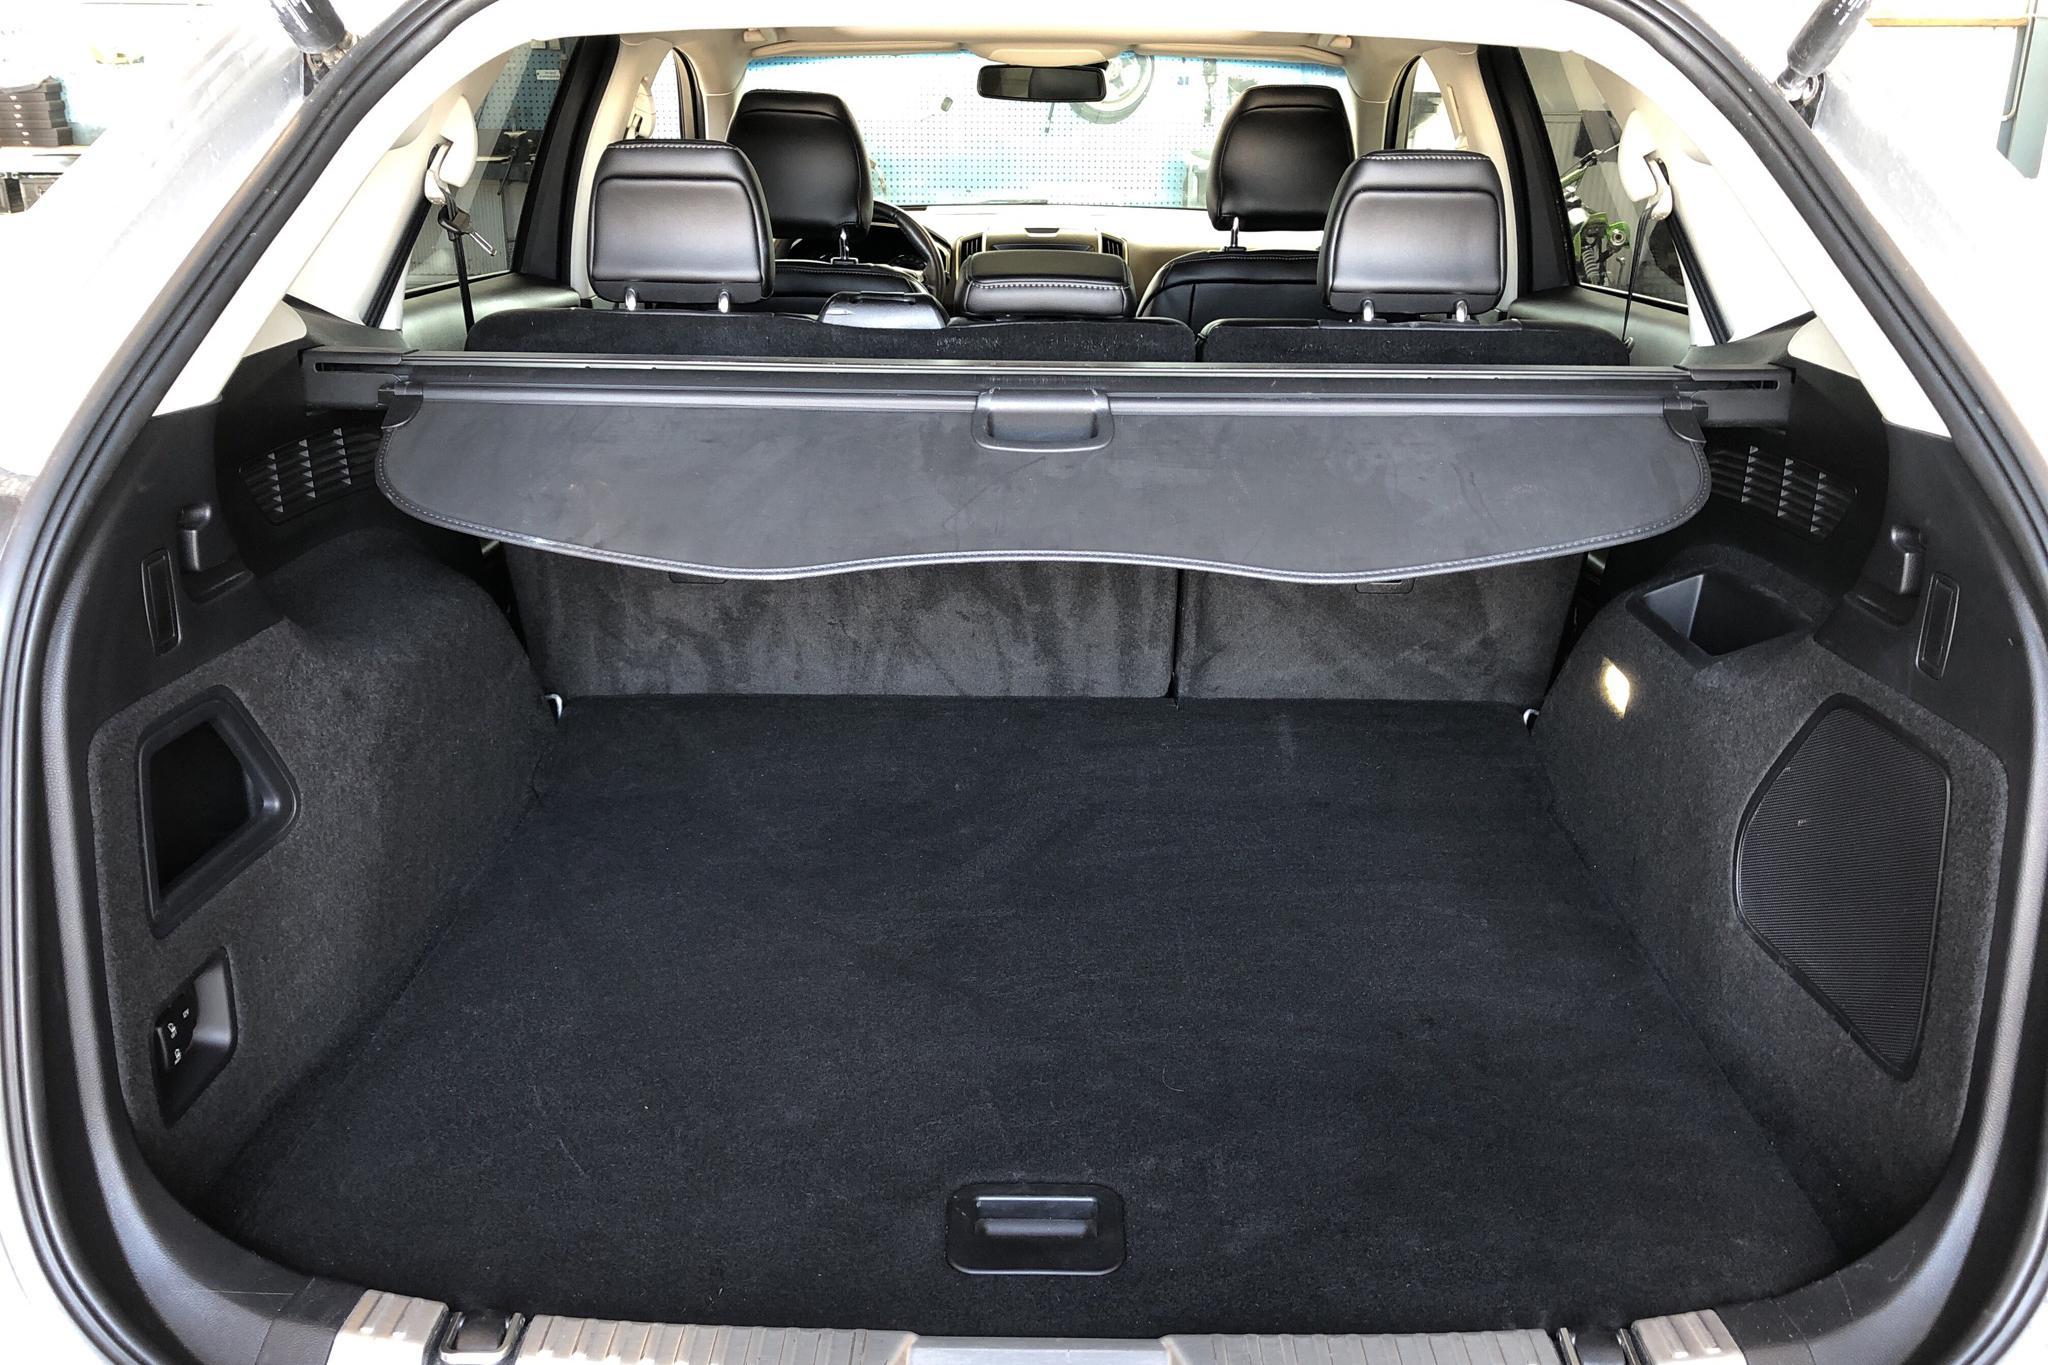 Ford Edge 2.0 TDCi (210hk) - 79 040 km - Automatic - gray - 2016